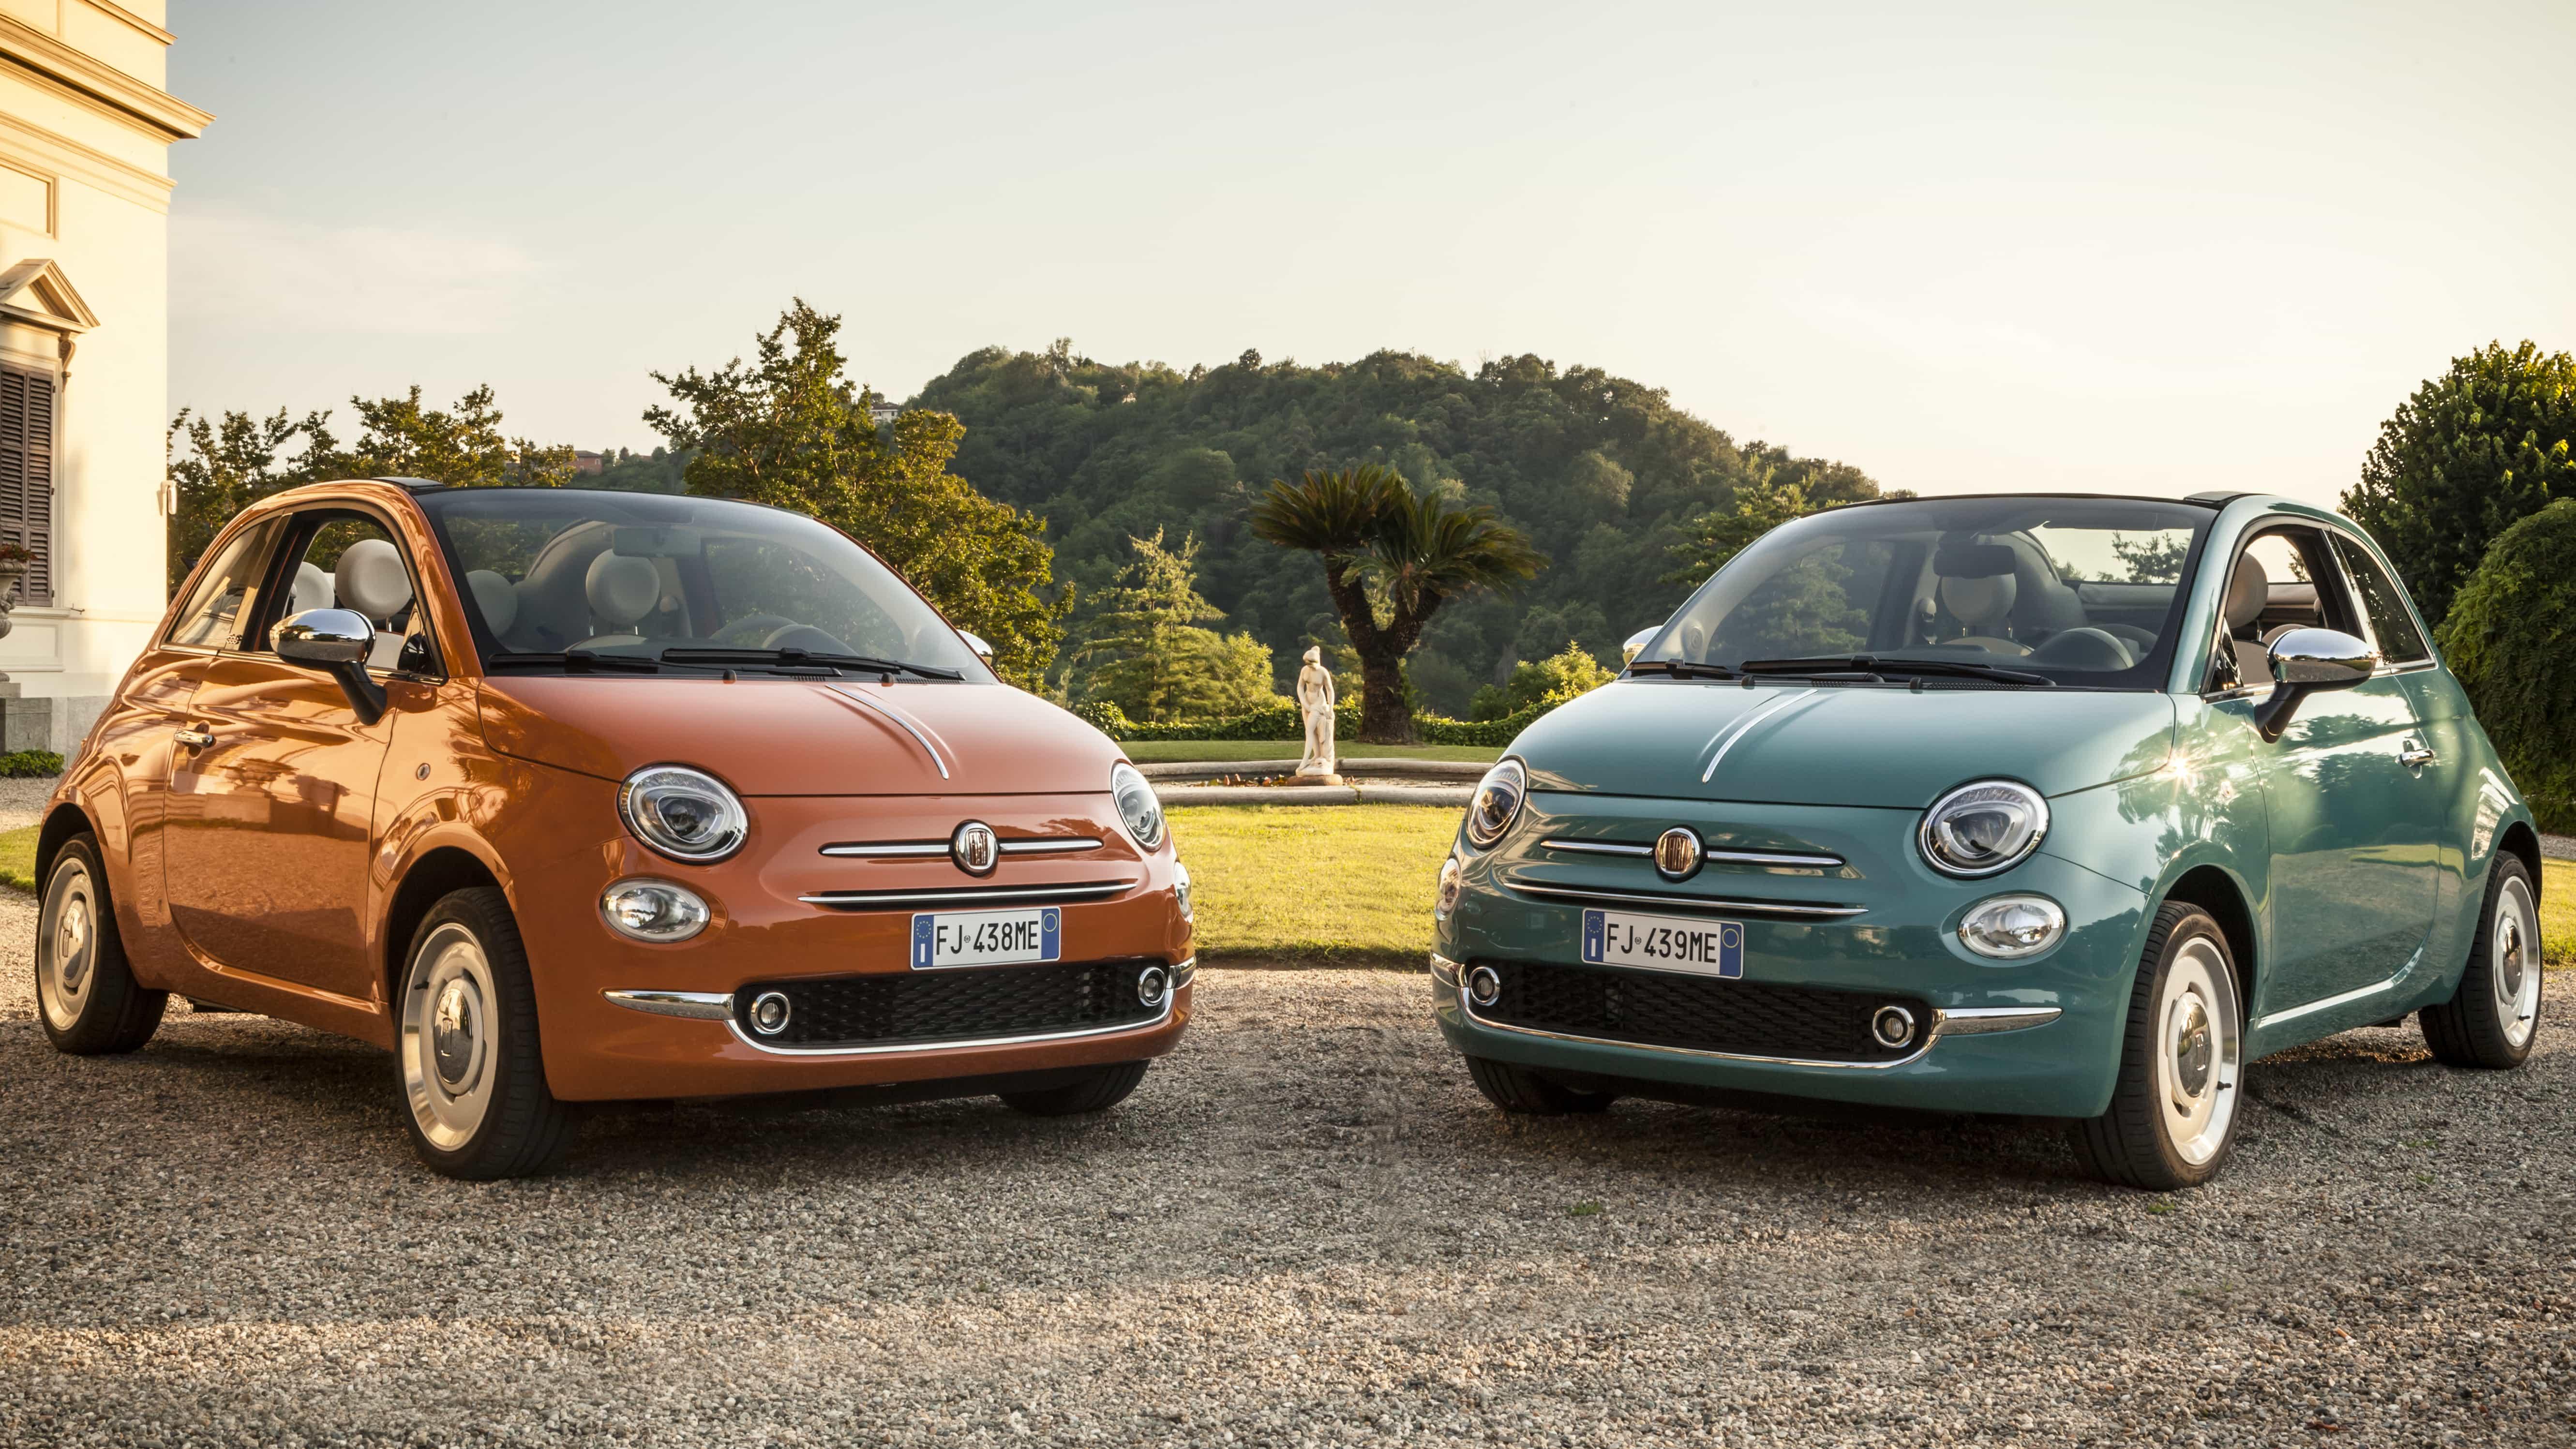 Fiat 500 Anniversario 2 Karoser Seçeneği İle Satışta